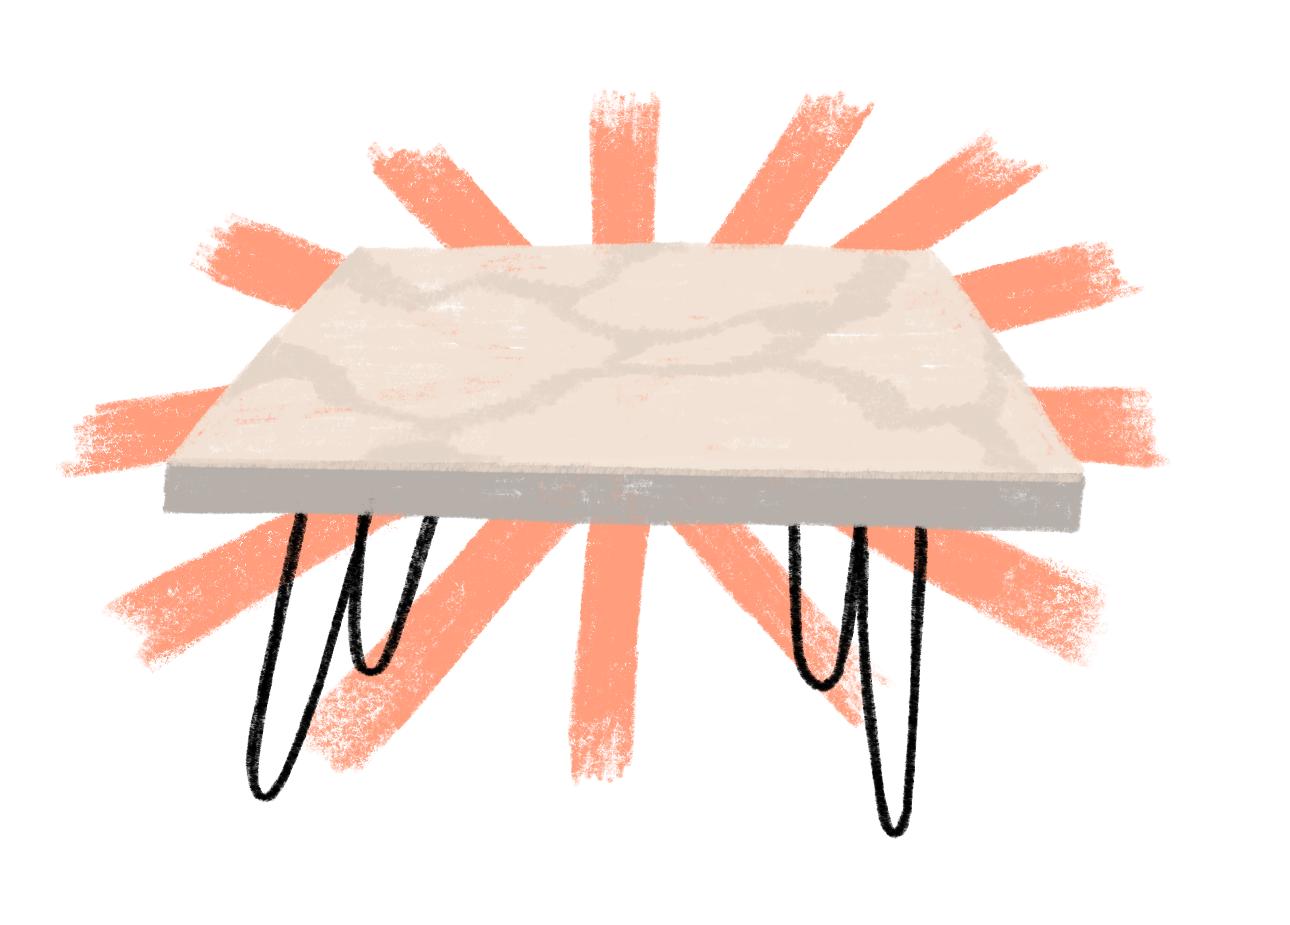 finished table illustration